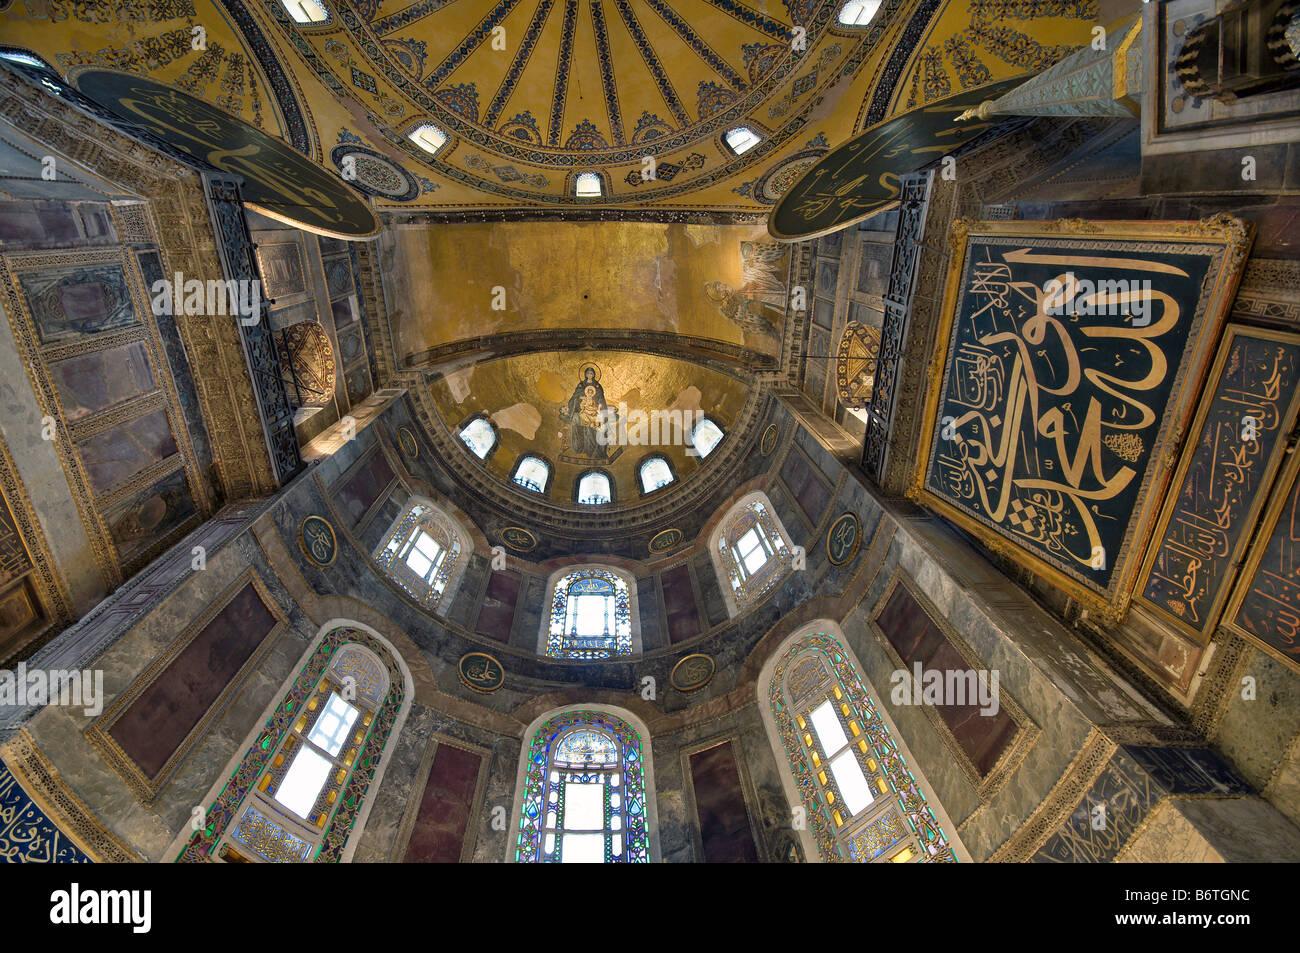 Interior View Of The Hagia Sophia Apse Mosaic Of The Theotokos Stock Photo Royalty Free Image